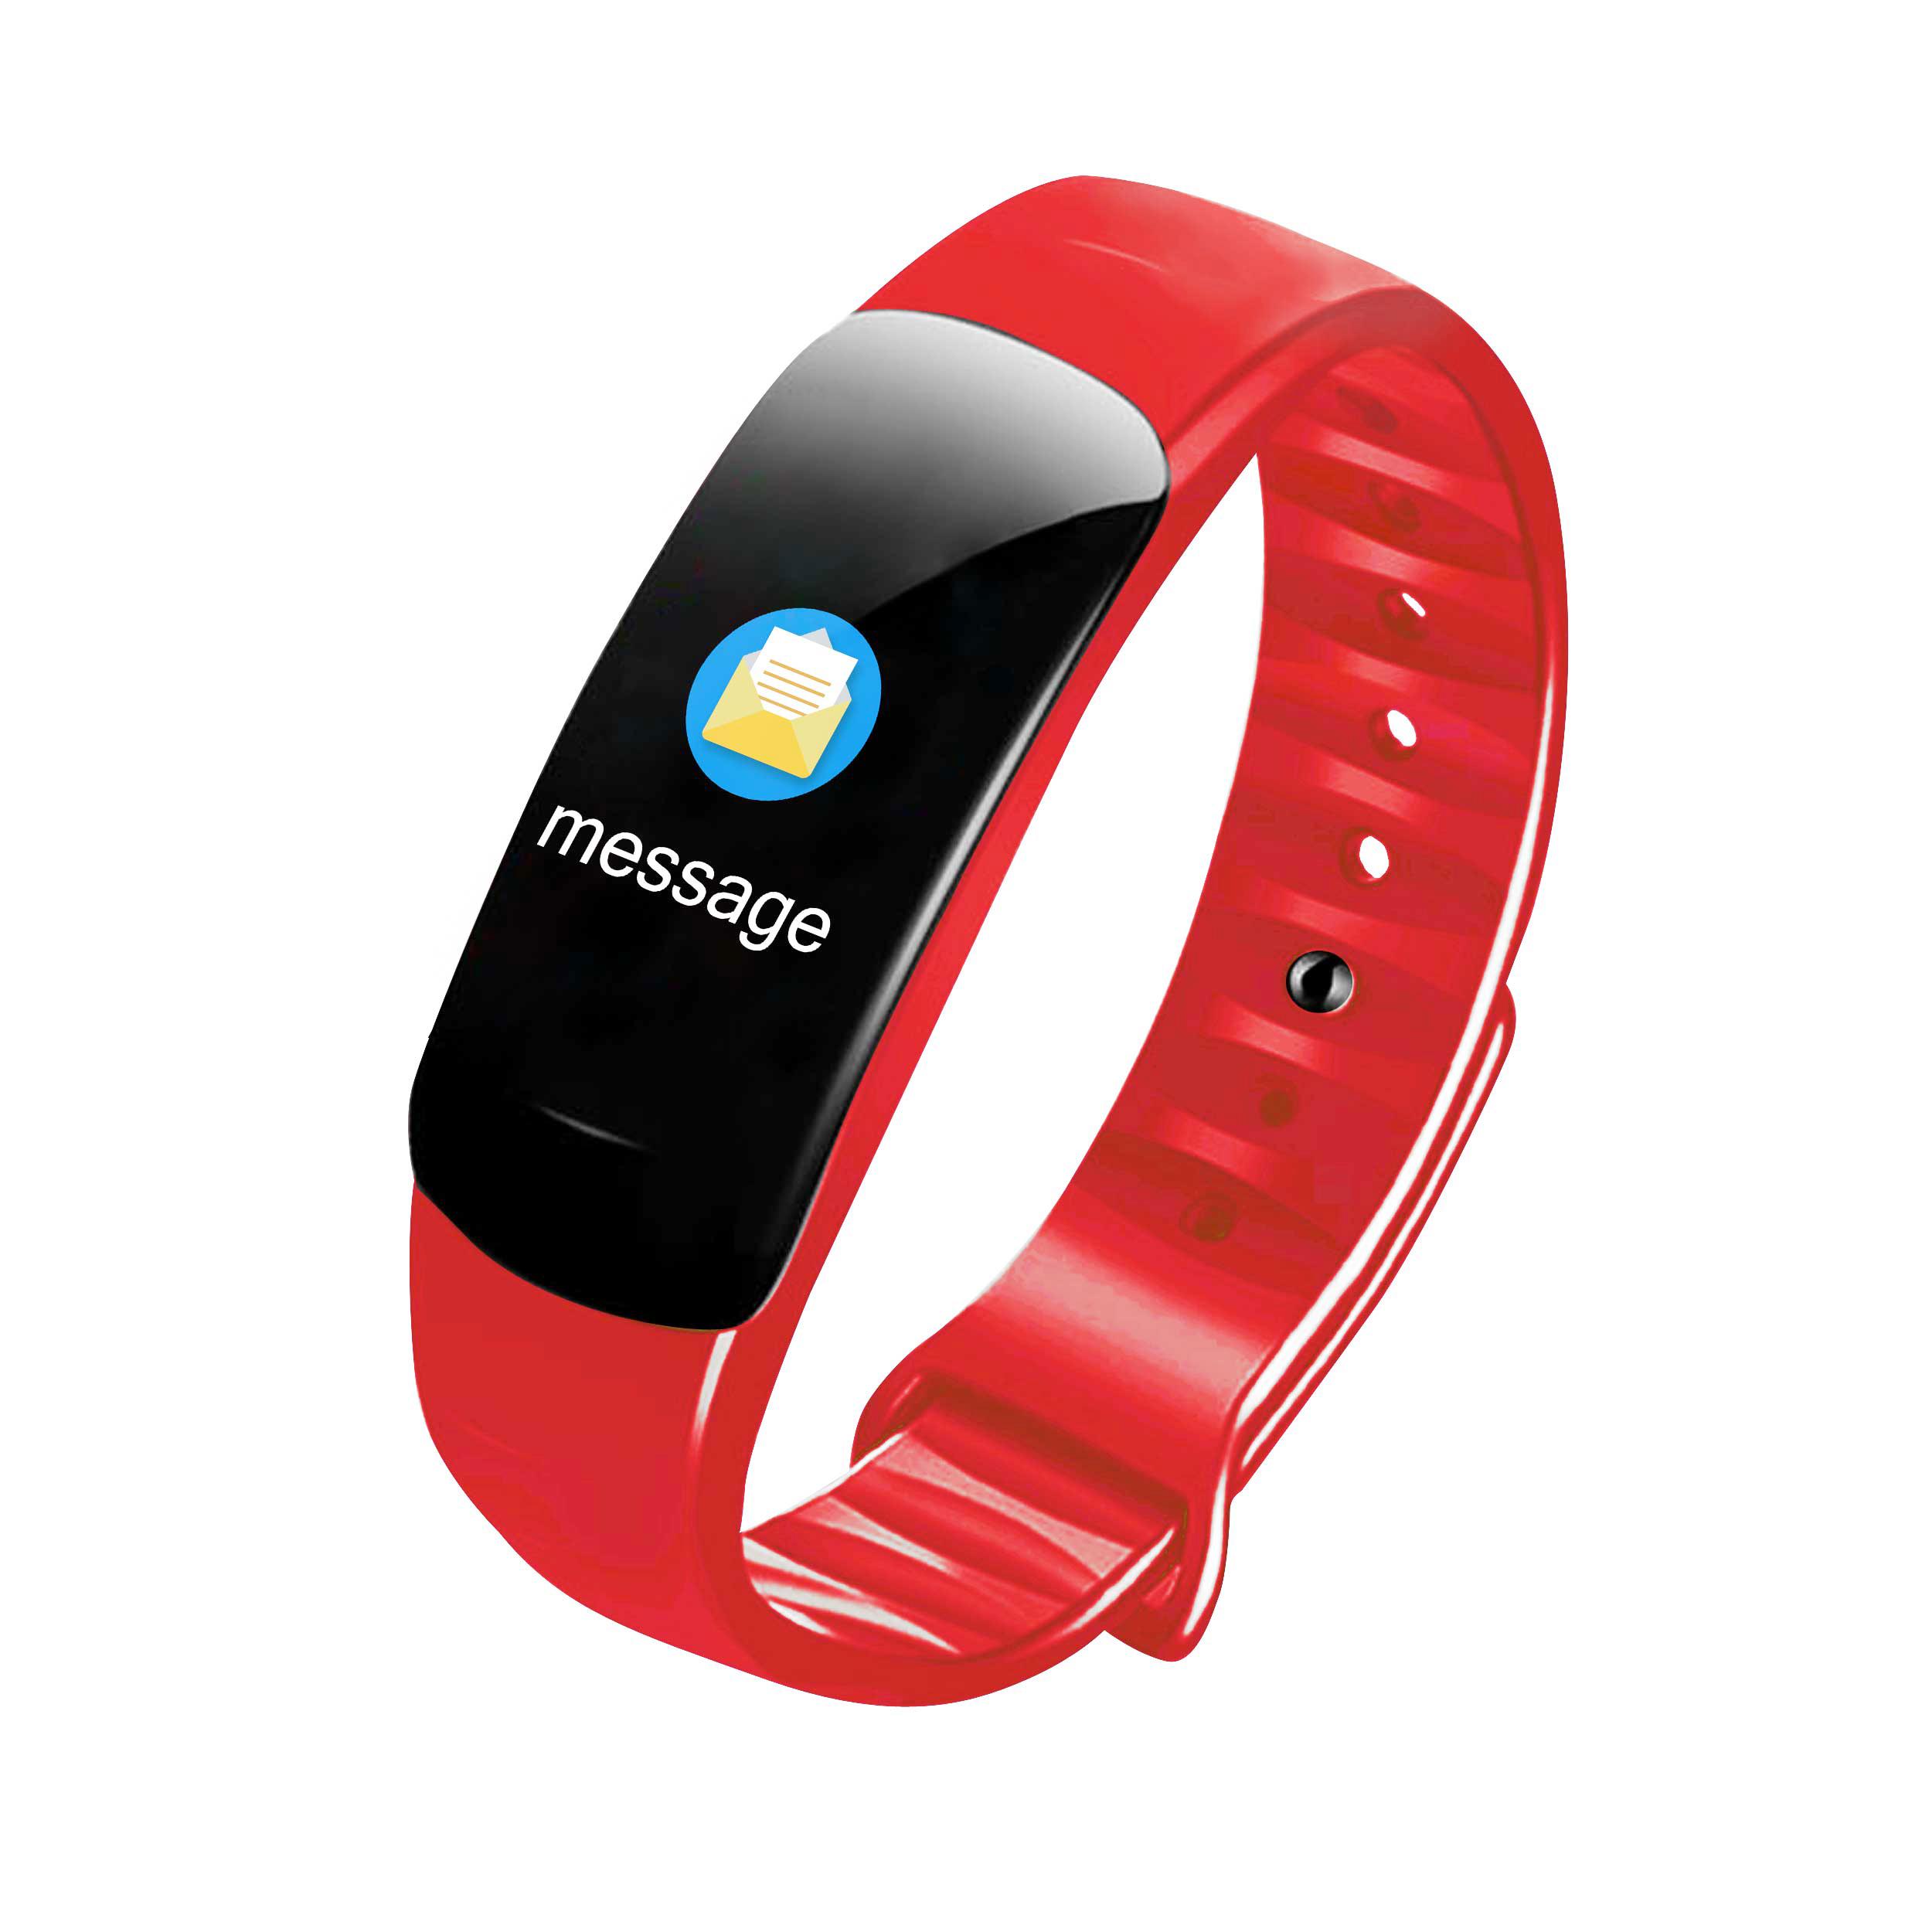 Fitness Bracelet Smart Watch Wristband Pedometer Heart Rate Monitor Activity Tracker smart bracelet red